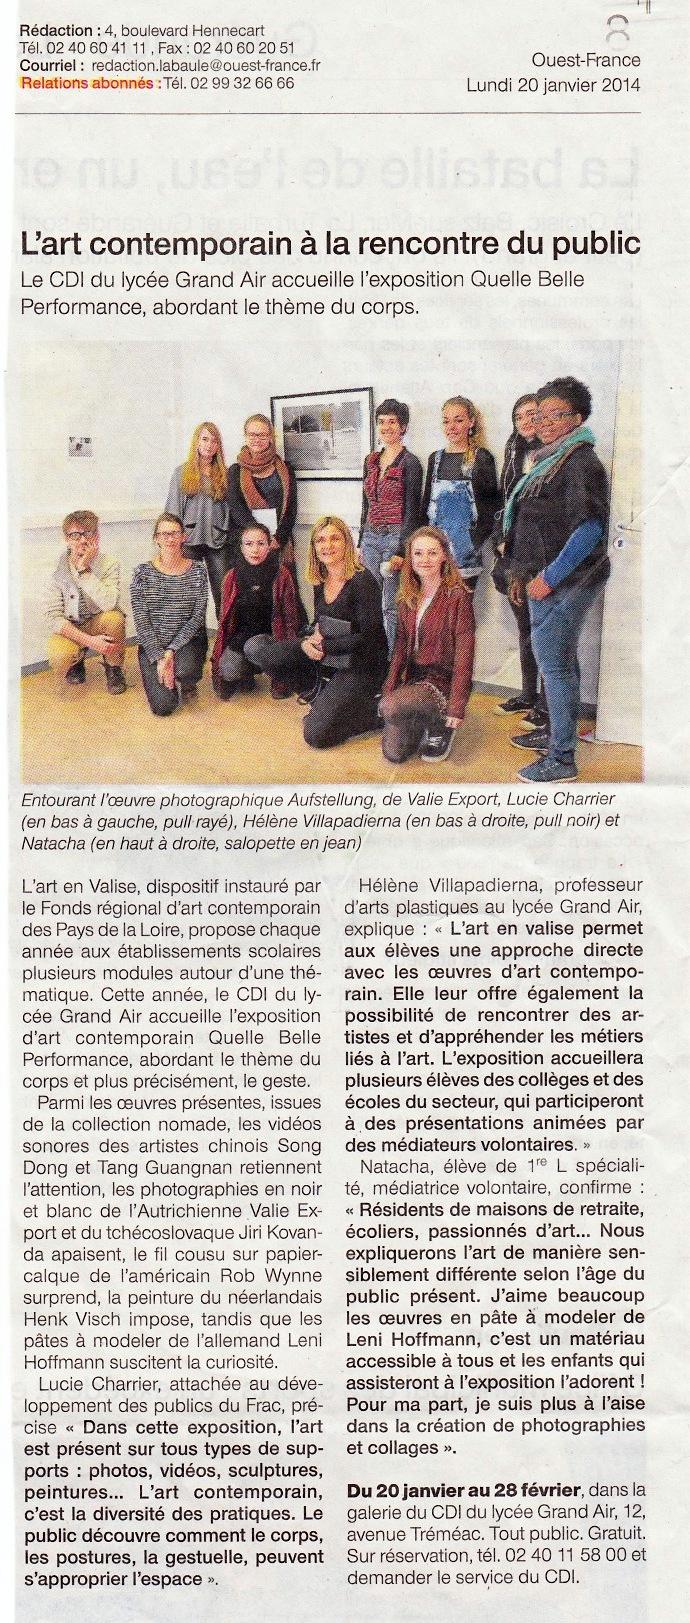 20 janvier 2014, Art en Valise, Ouest-France